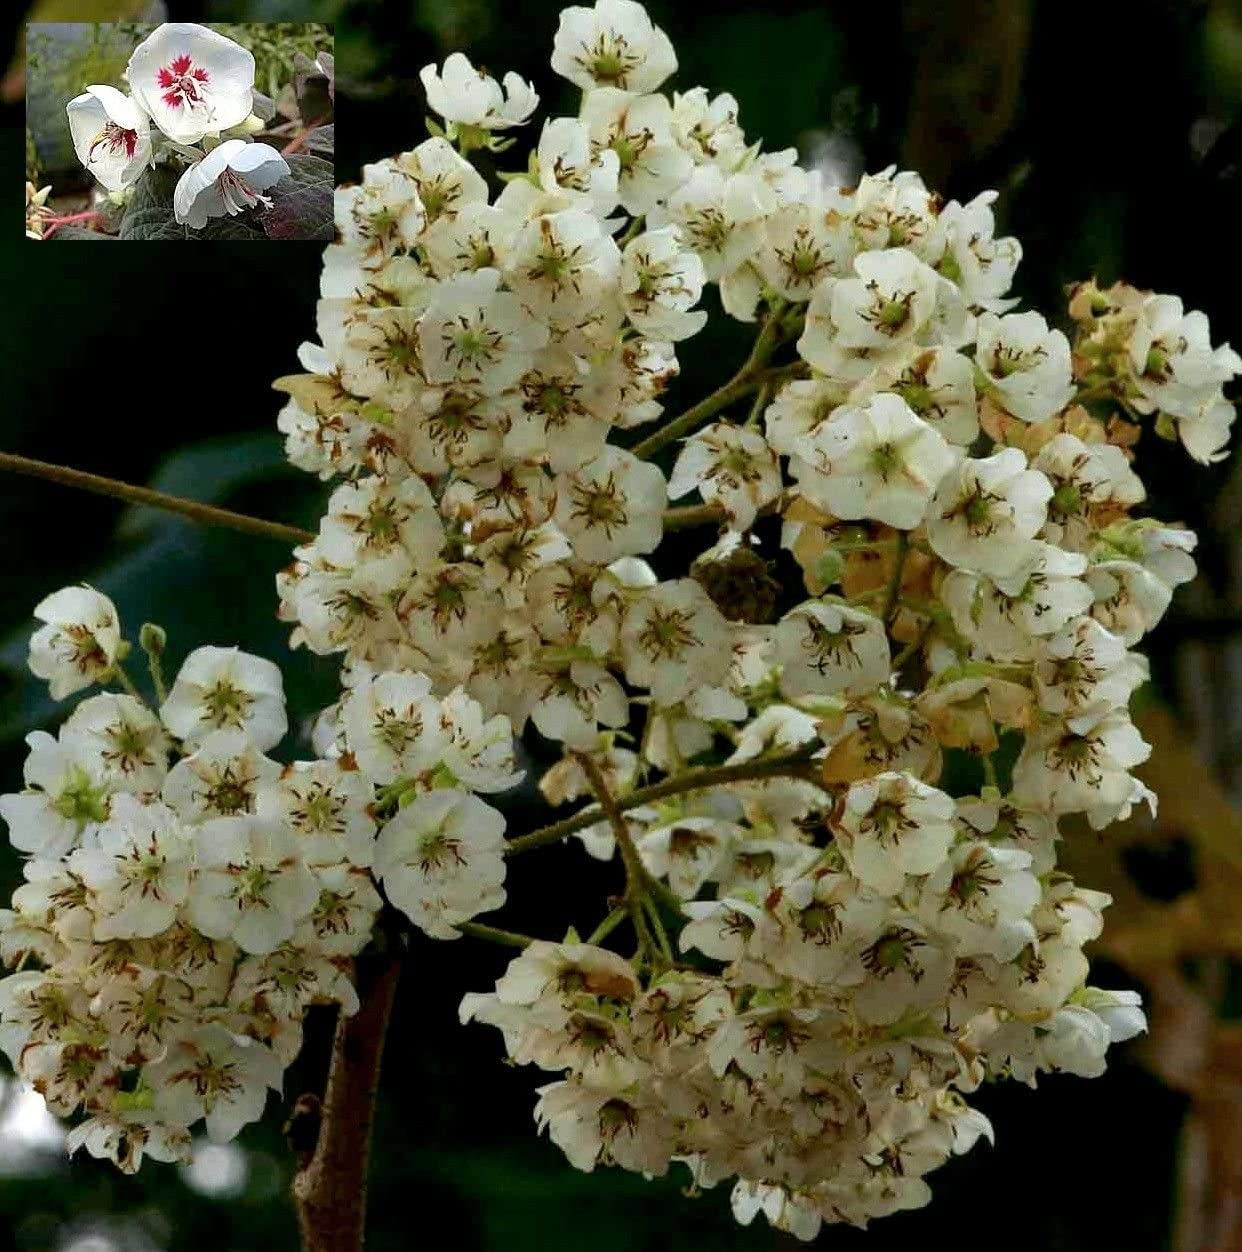 Dombeya Rotundifolia African Wild Pear Rare Tropical Bonsai Tree Seeds 5 Amazon Co Uk Garden Outdoors